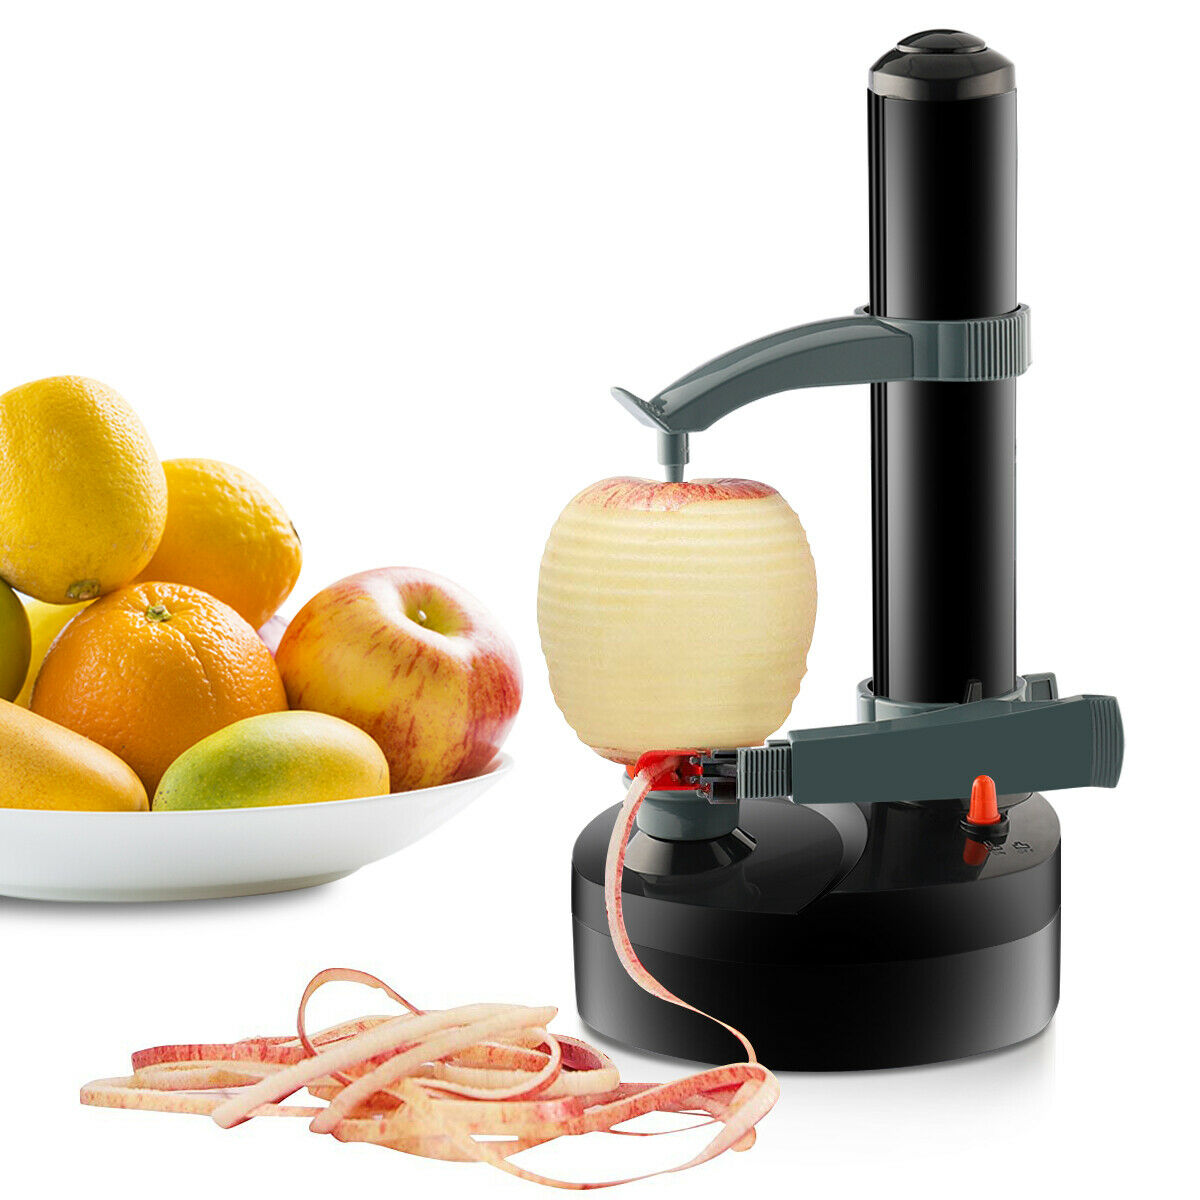 Electric 1kg Automatic Potato Peeler Cutter Machine 6 Blades Crystals